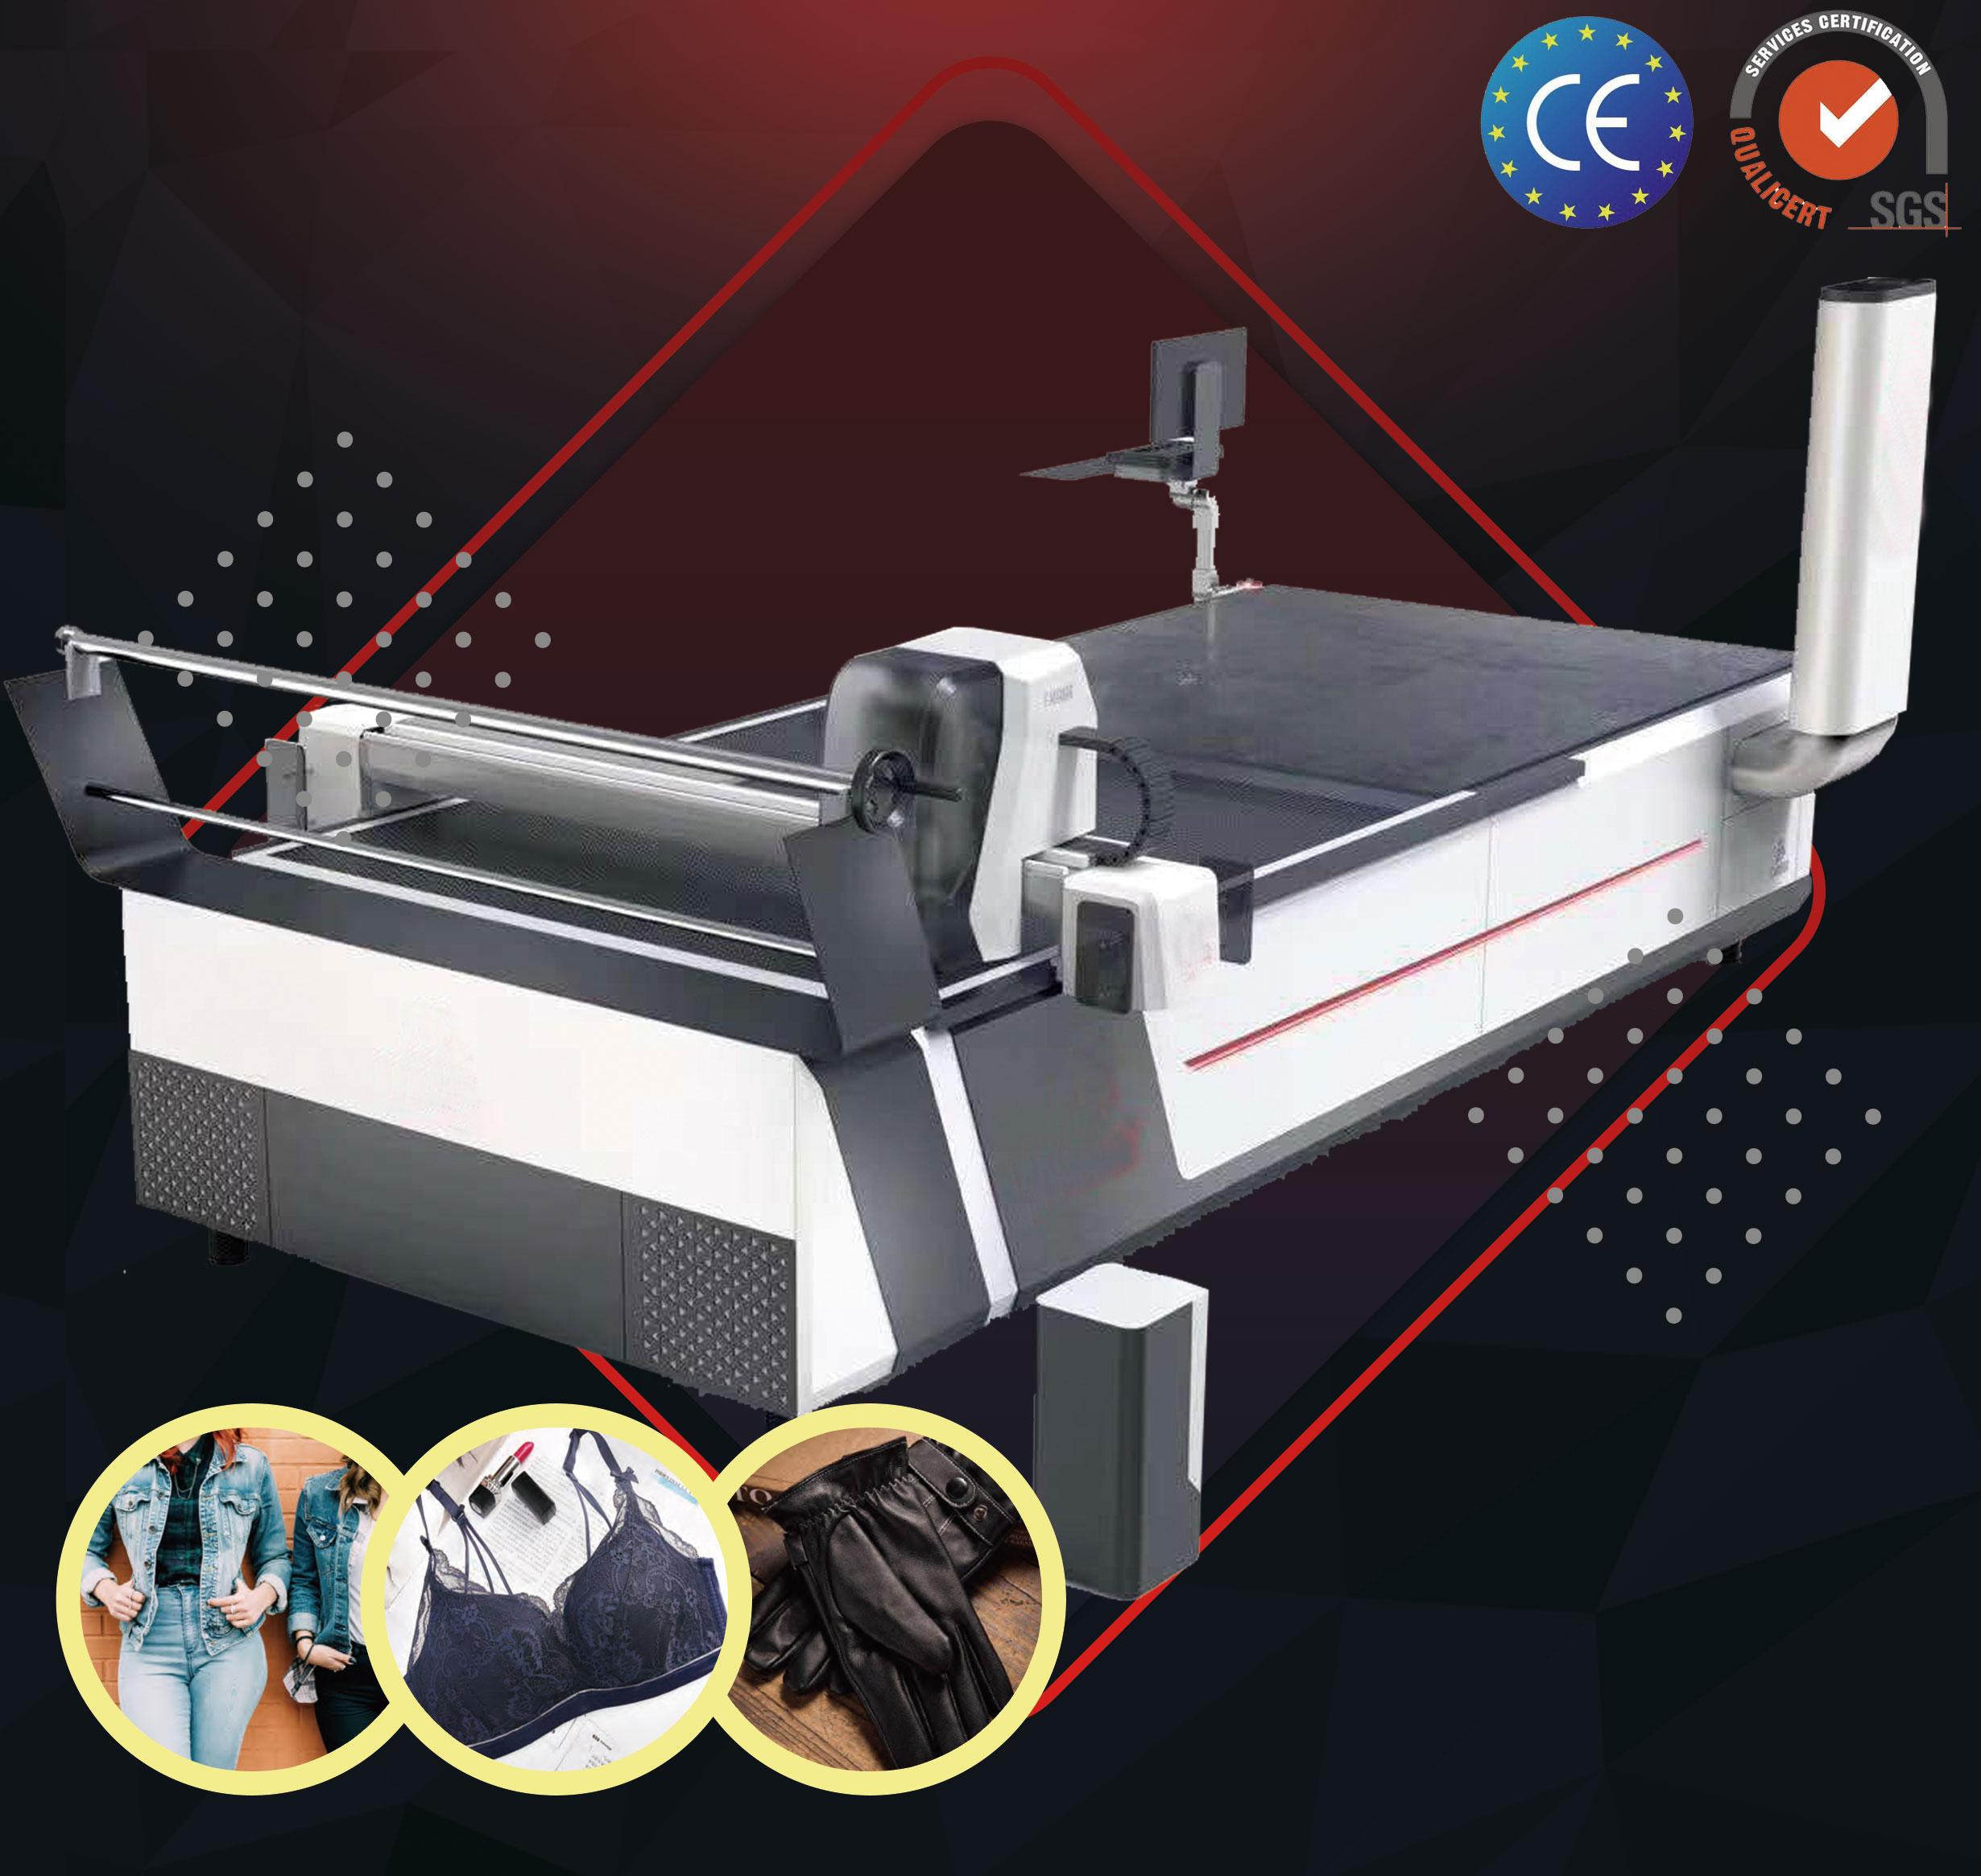 Full Auto Cutter for Garment